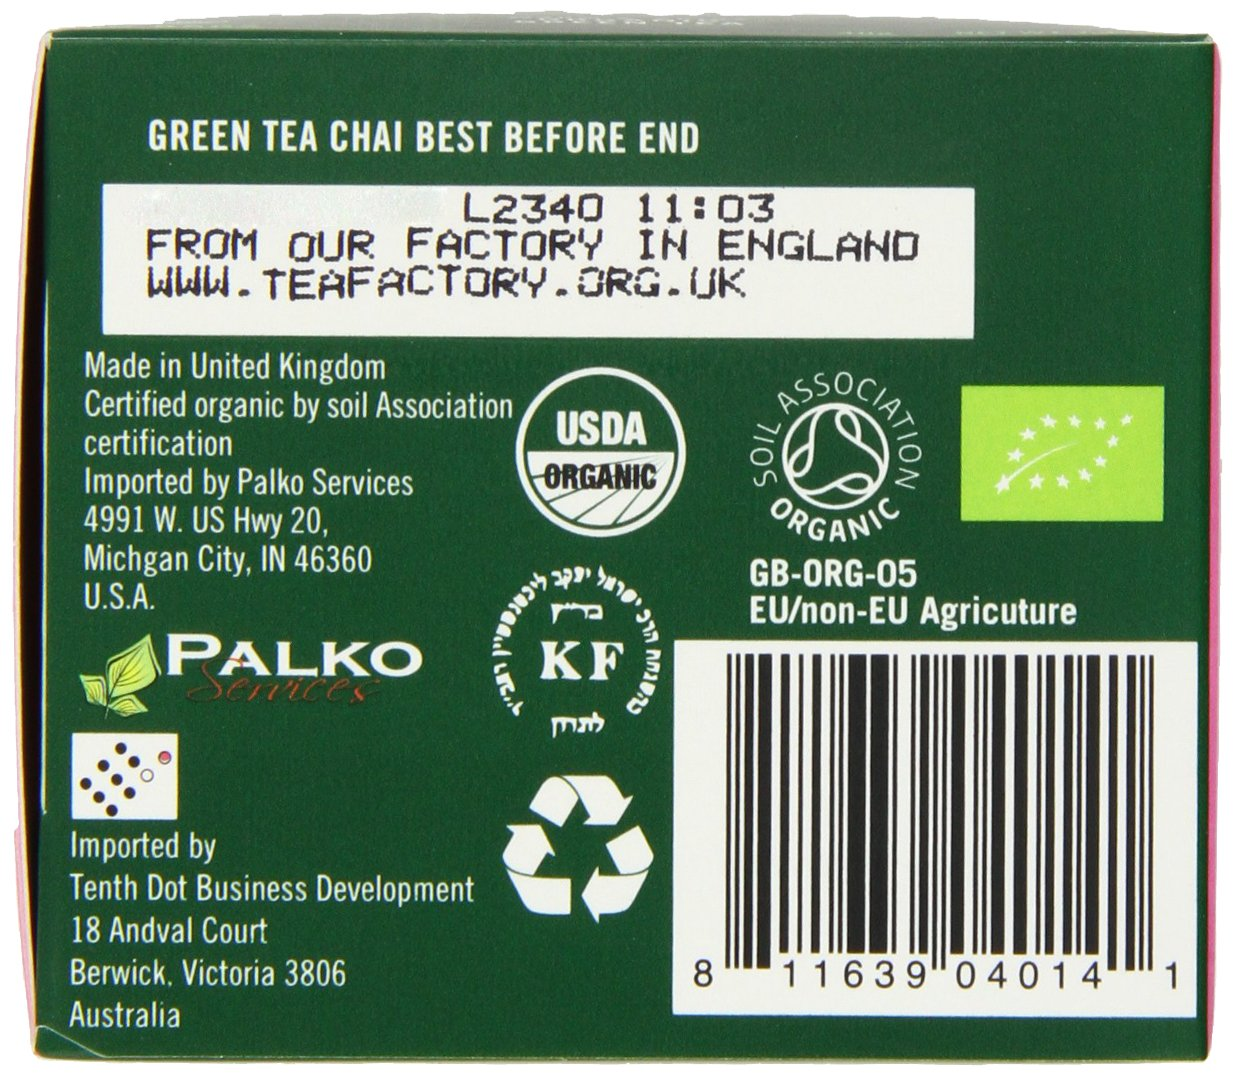 Higher Living Organic Teas Green Chai, 20 Count (Pack of 6) by Higher Living Organic Teas (Image #1)